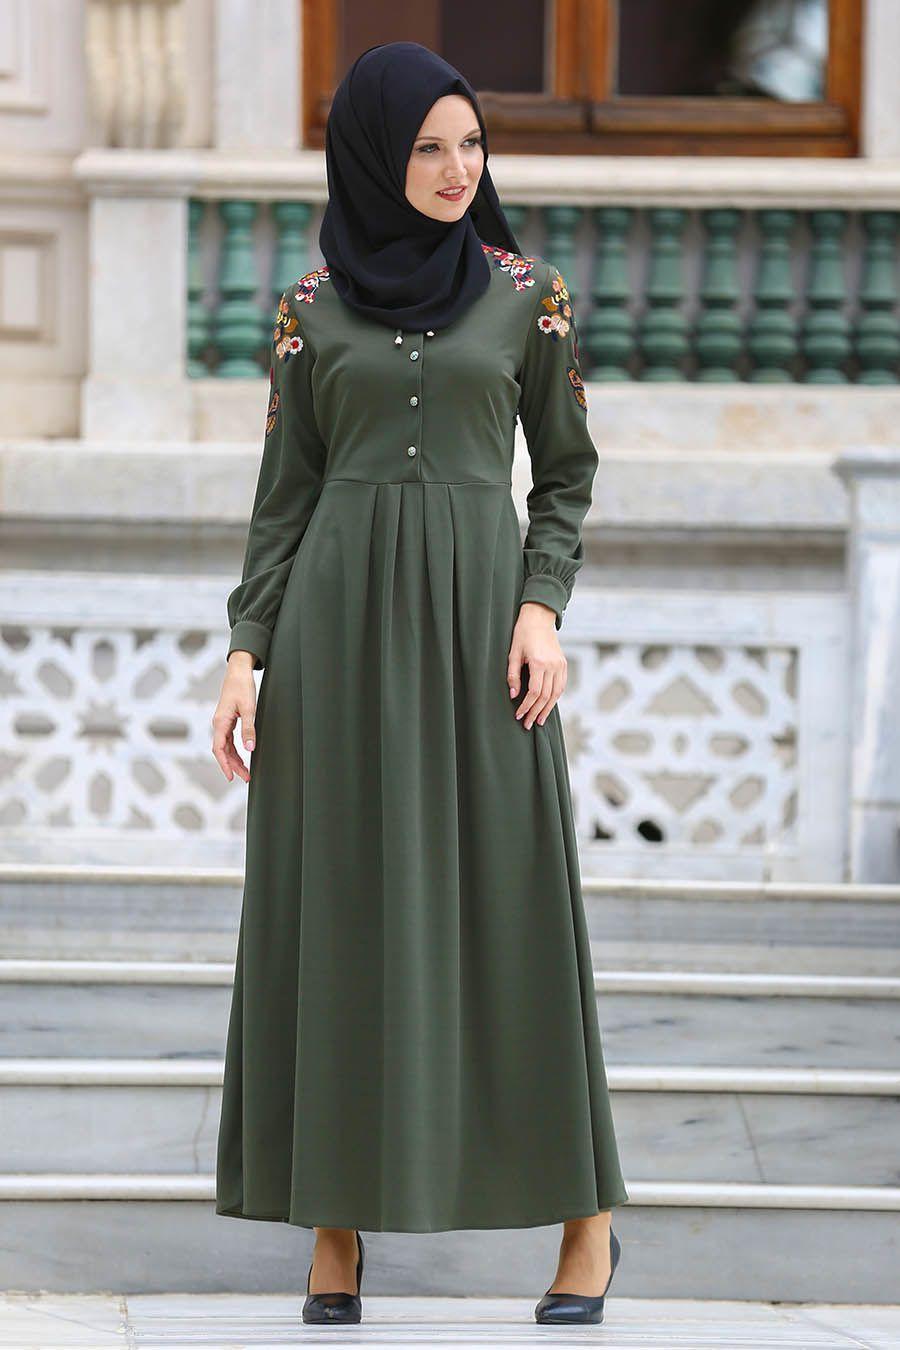 Nakisli Tesettur Penye Elbise Modelleri Moda Stilleri Elbise Modelleri Elbise